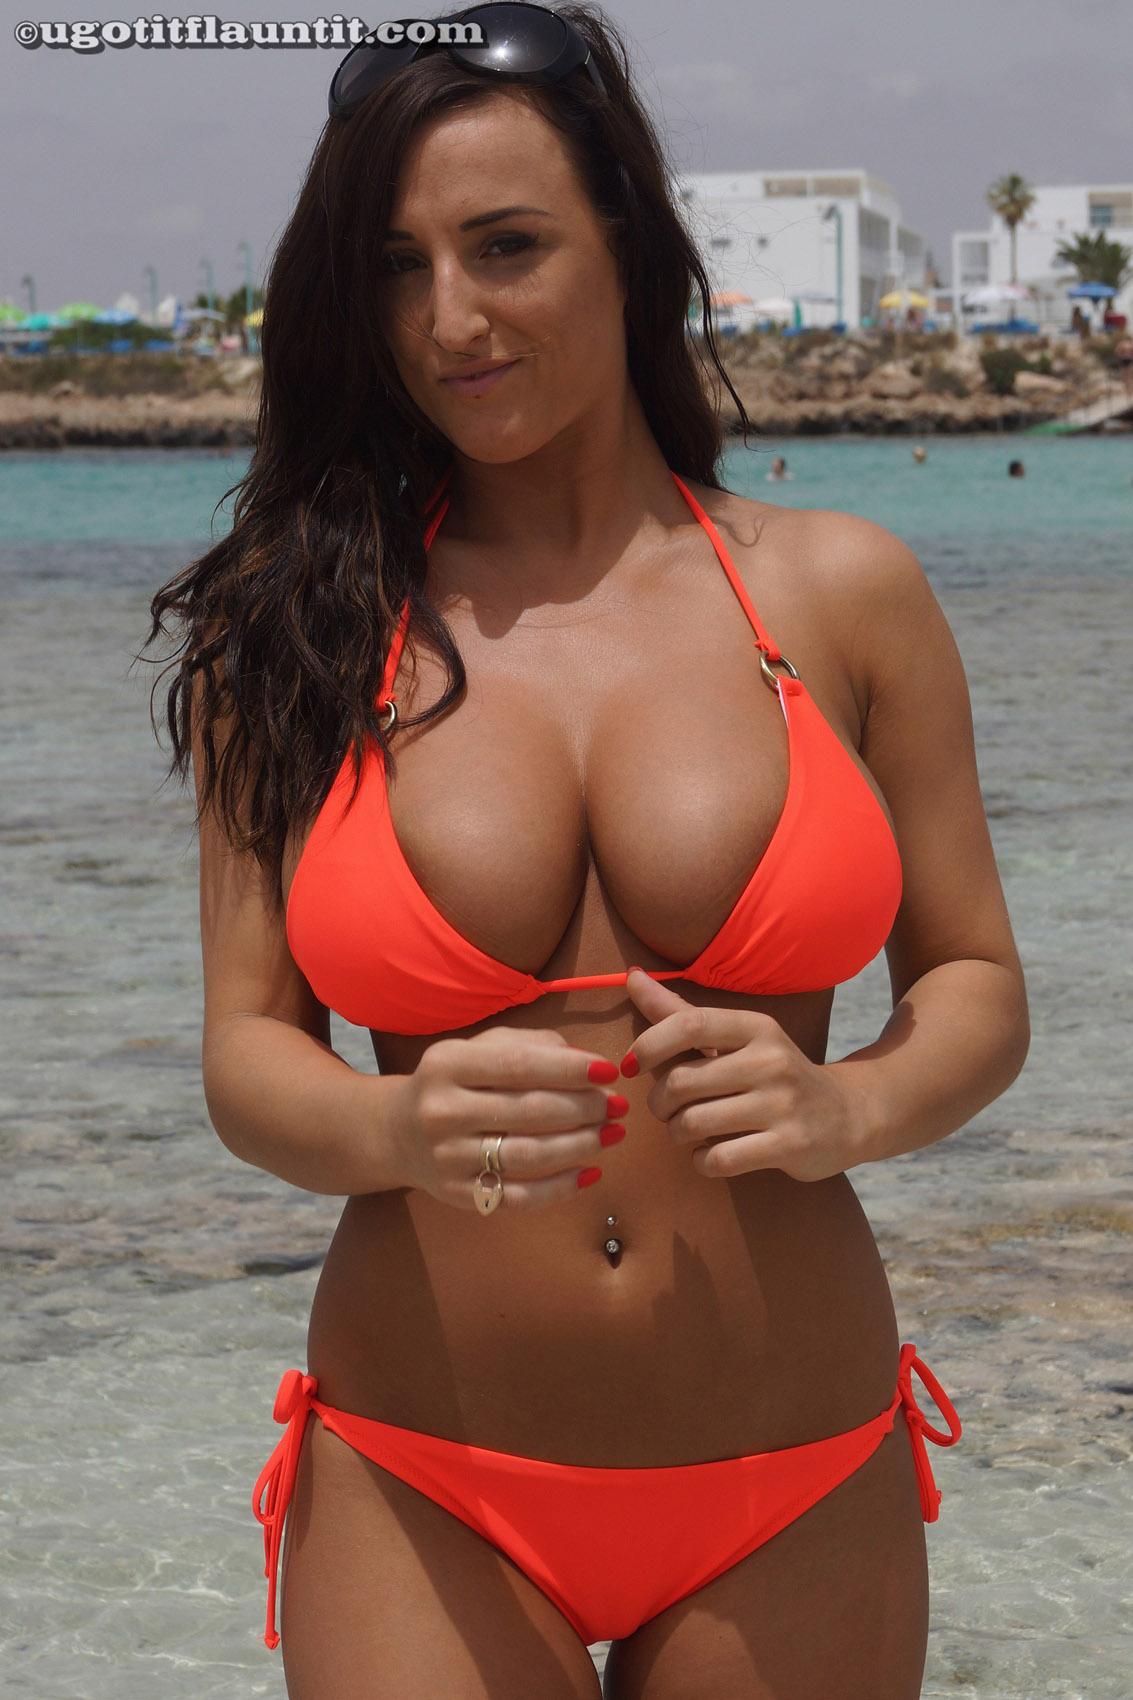 Hot big boobs in bikini answer matchless